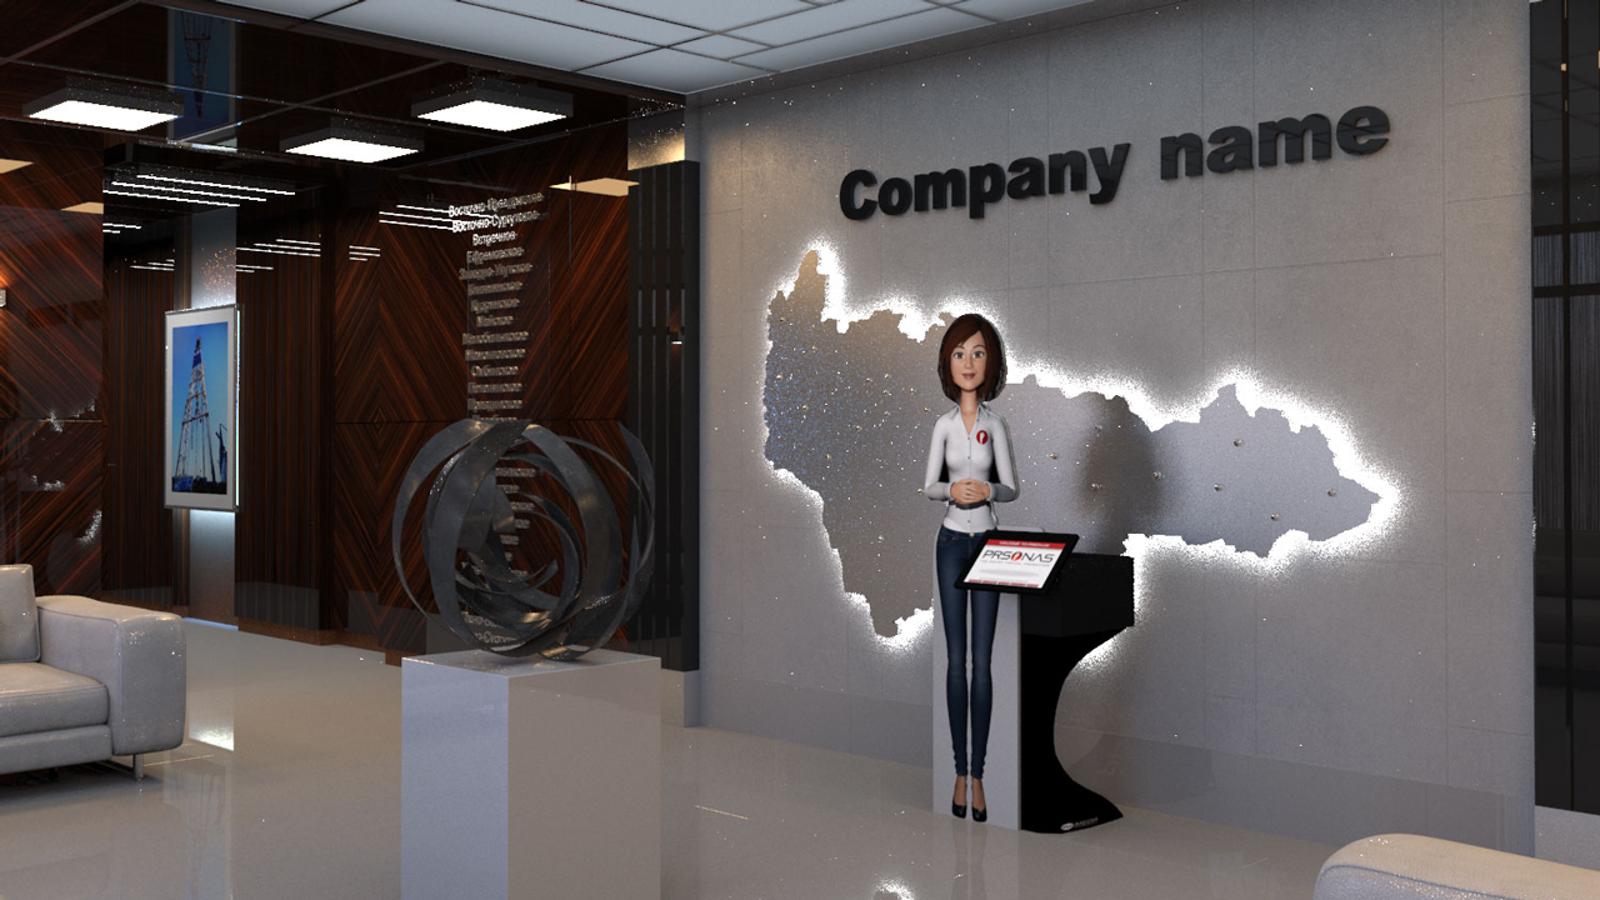 PRSONAS-Wayfinding™ intelligent digital wayfinding